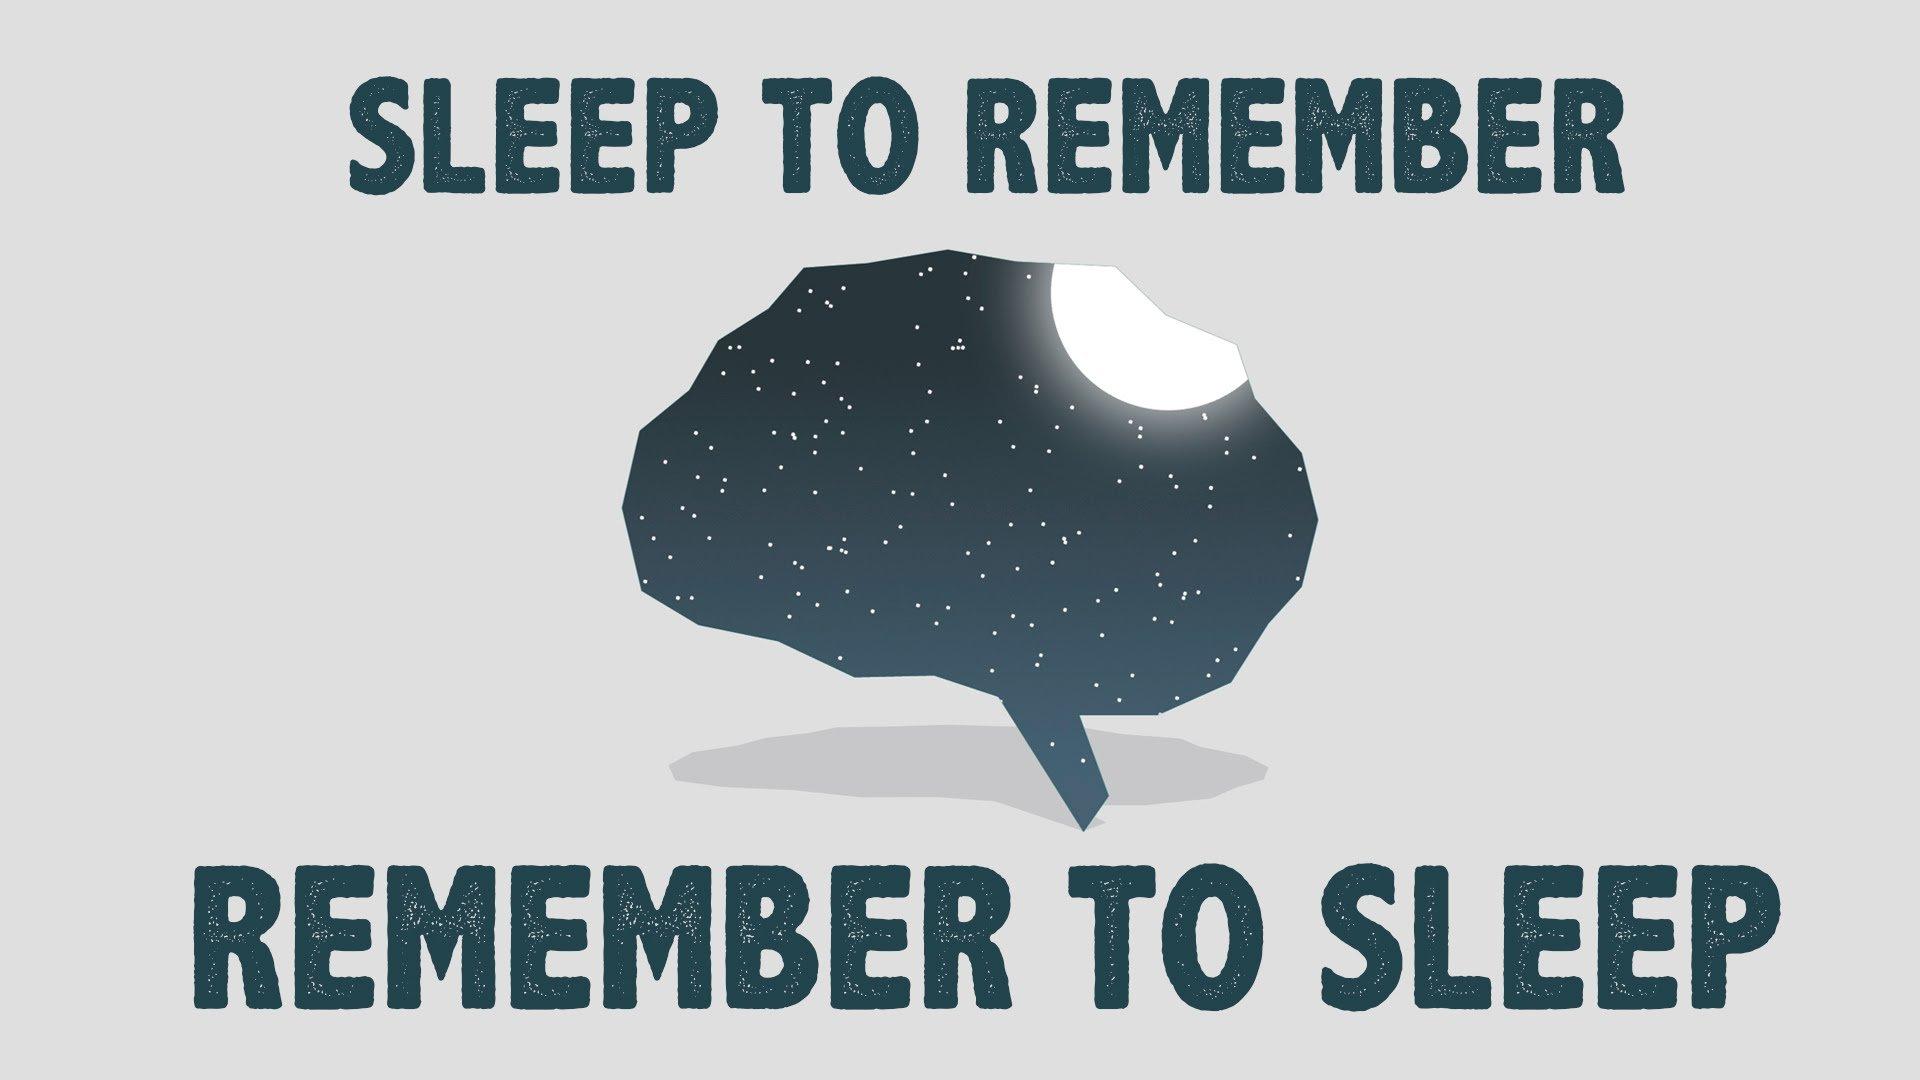 Remember to Sleep, Sleep to Remember!